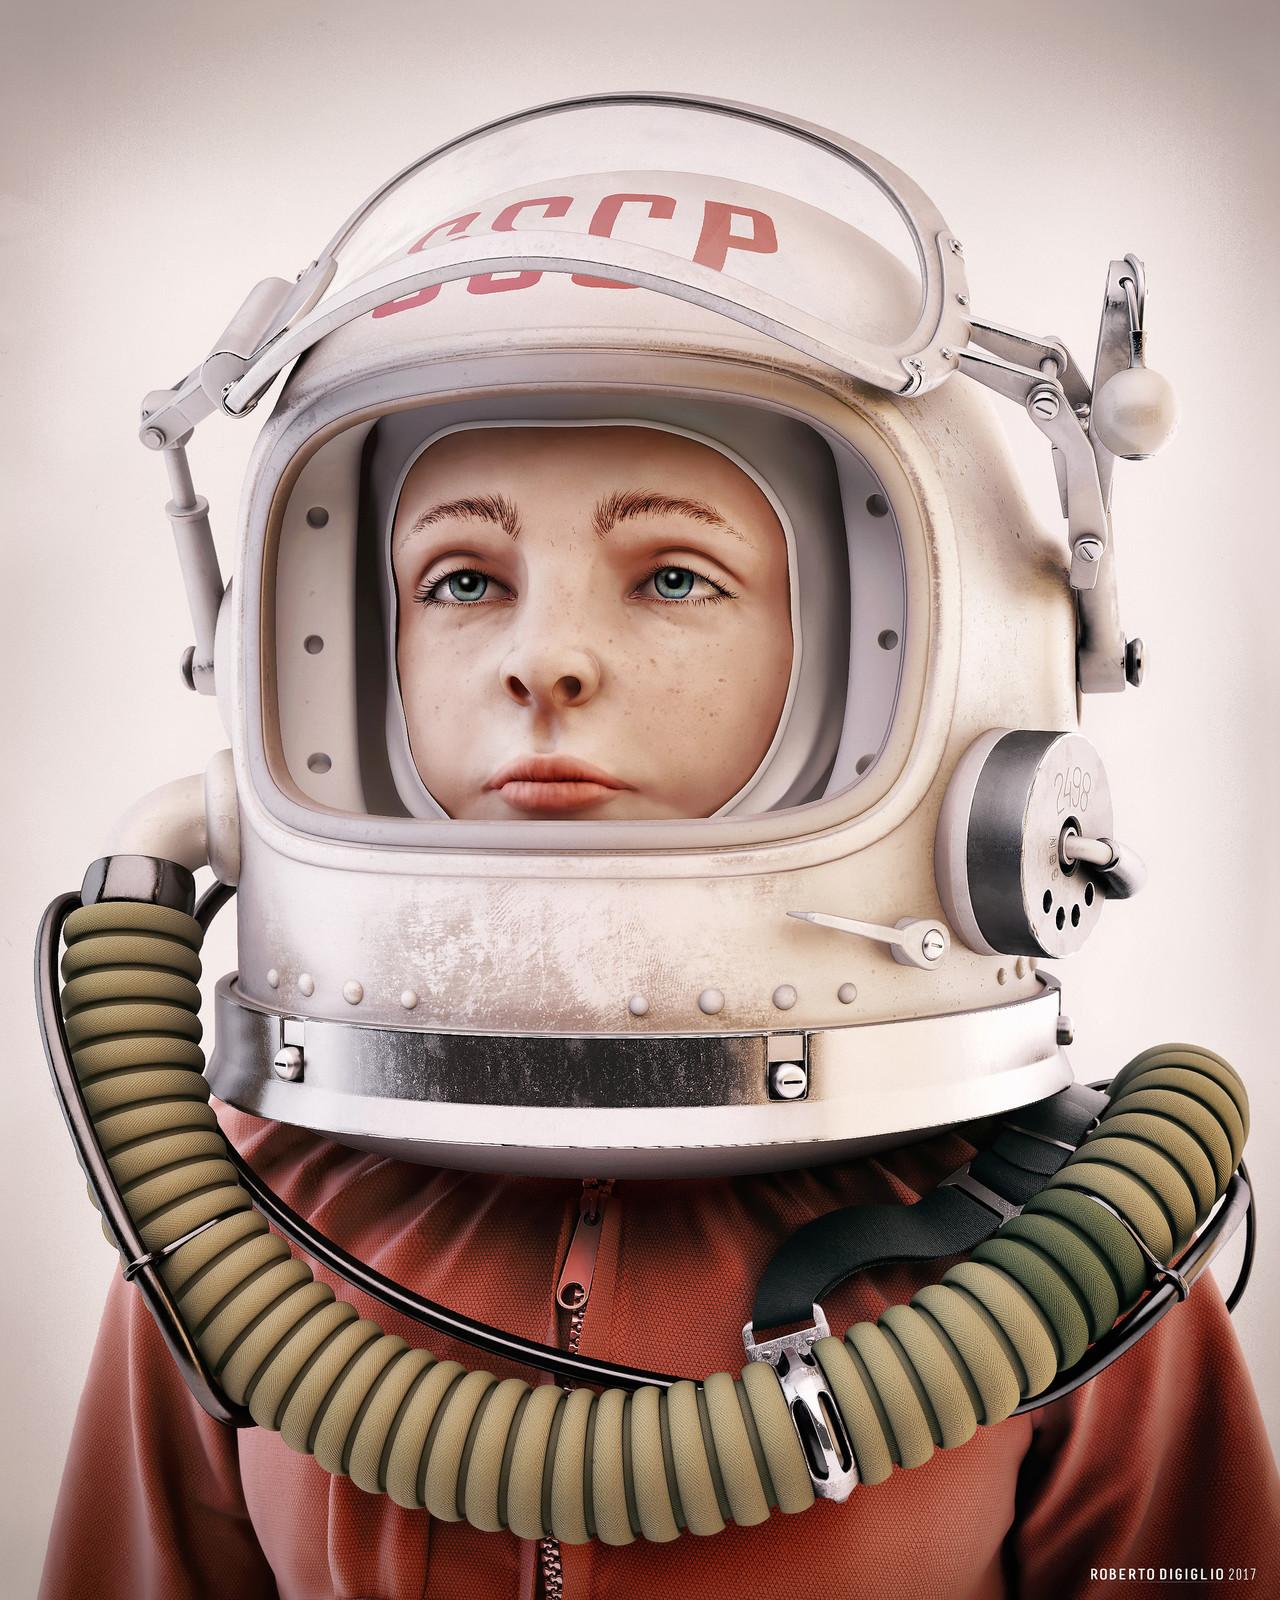 The Little Cosmonaut